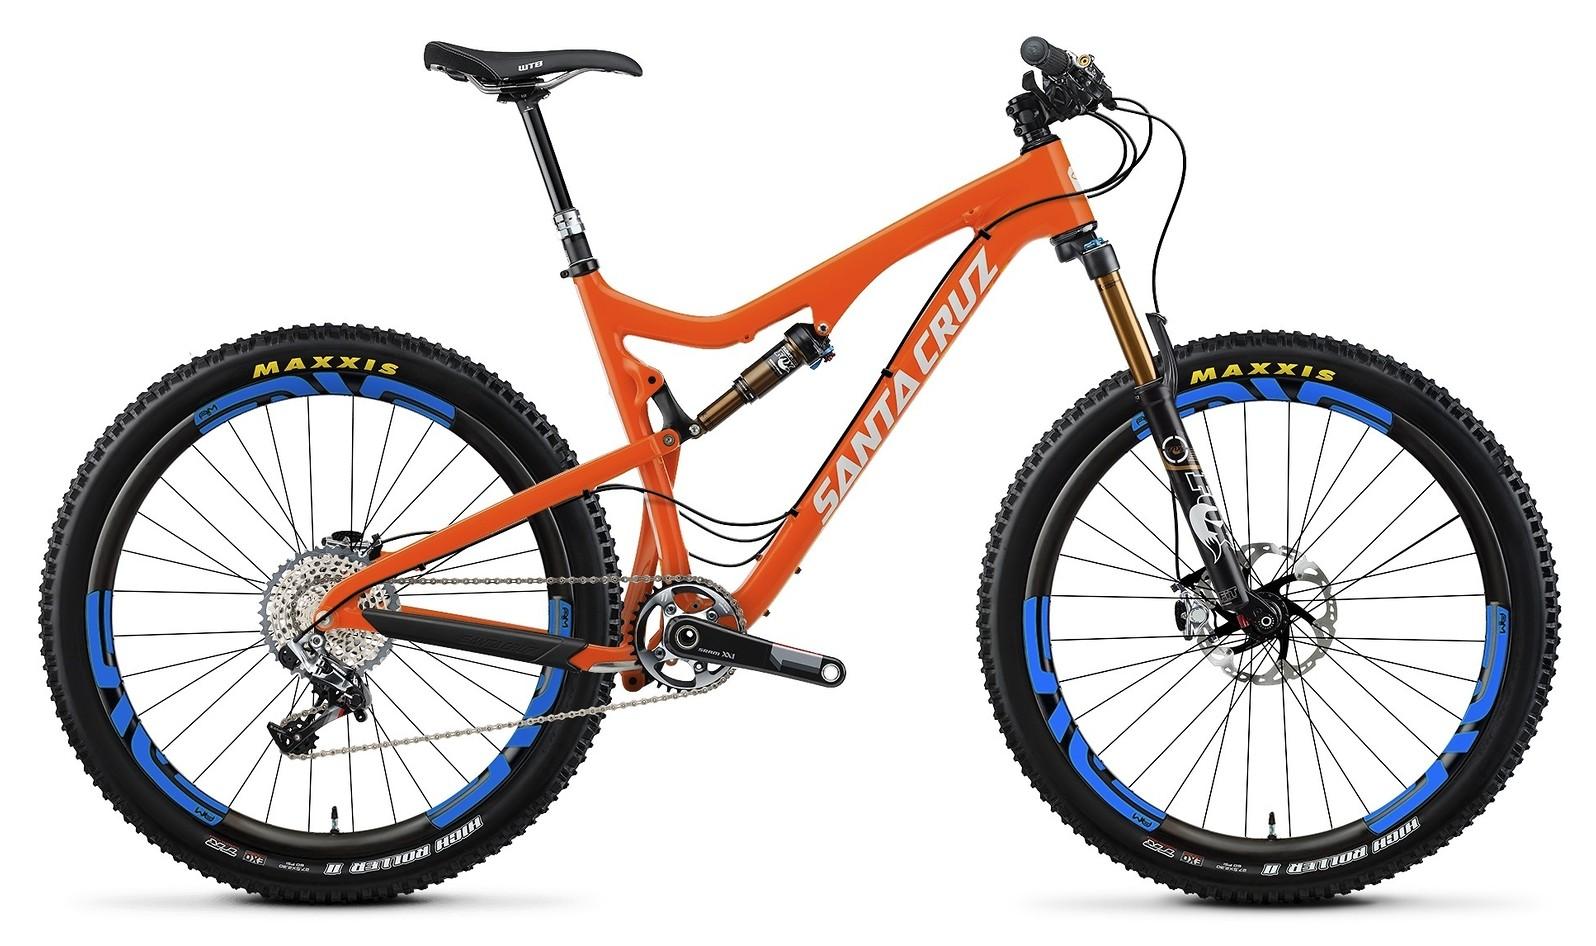 2014 Santa Cruz 5010 Carbon XX1 AM 27.5 with ENVE Wheels  2014 Santa Cruz 5010 Carbon XX1 AM 27.5 with ENVE Wheels